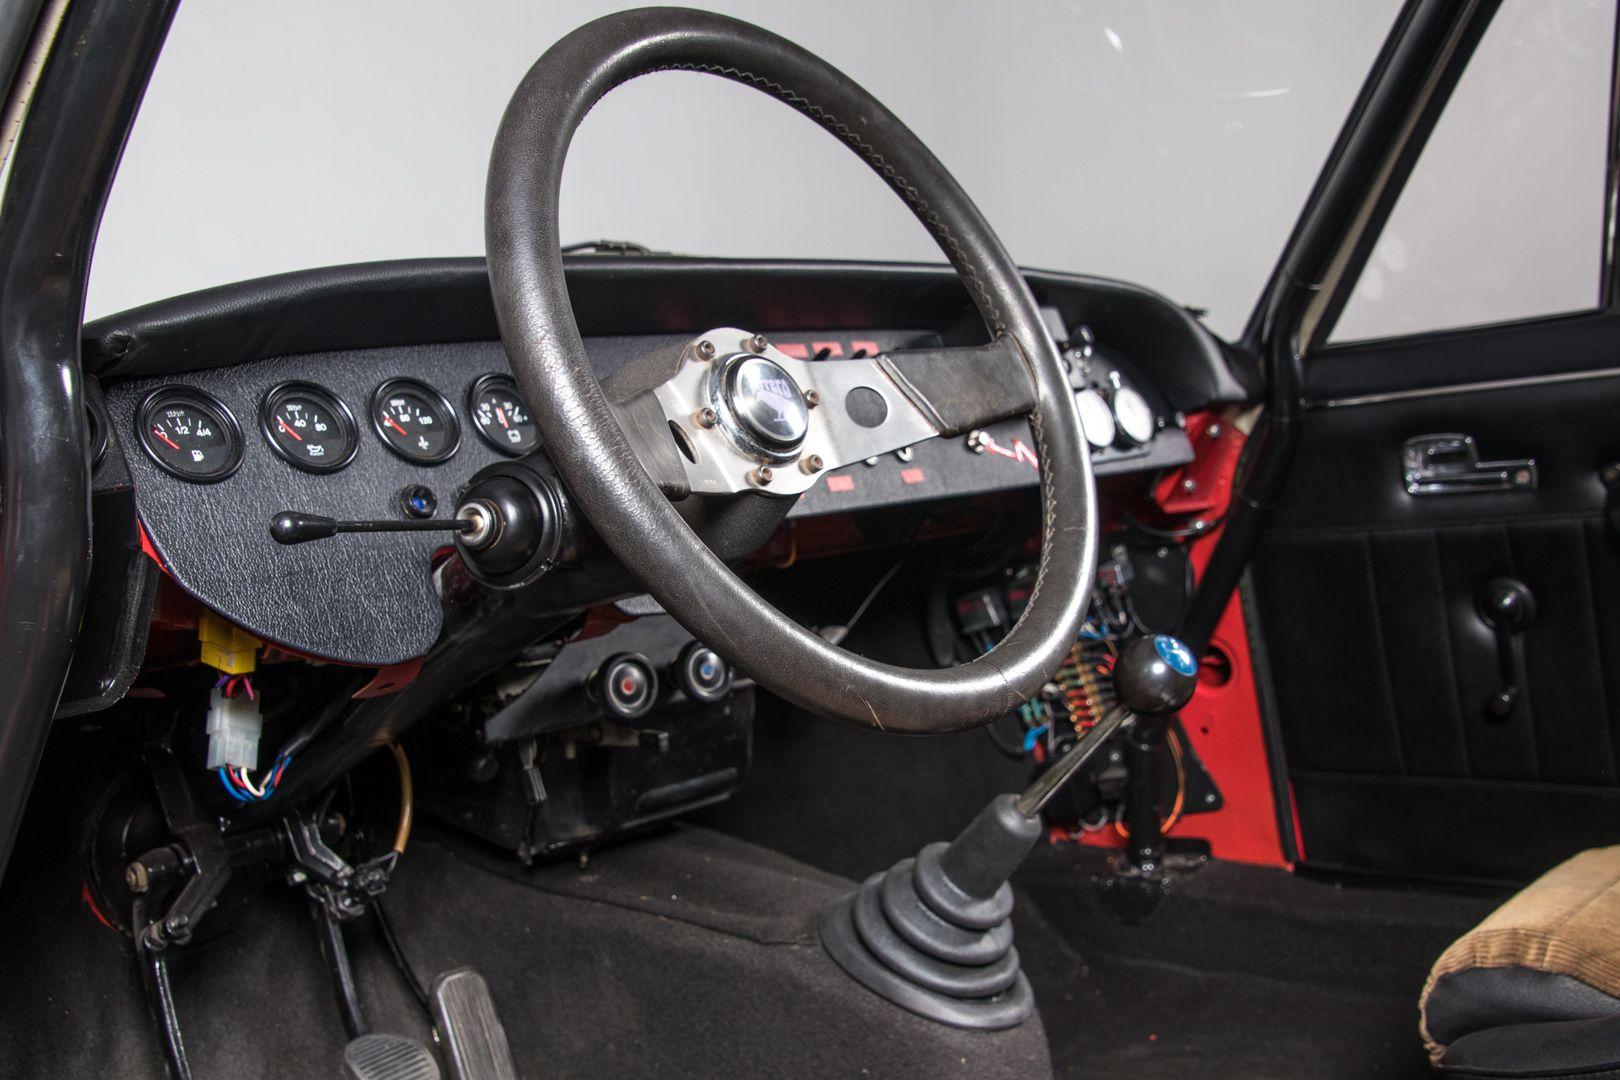 1970 Lancia Fulvia HF 1.6 - Gruppo 4 18818